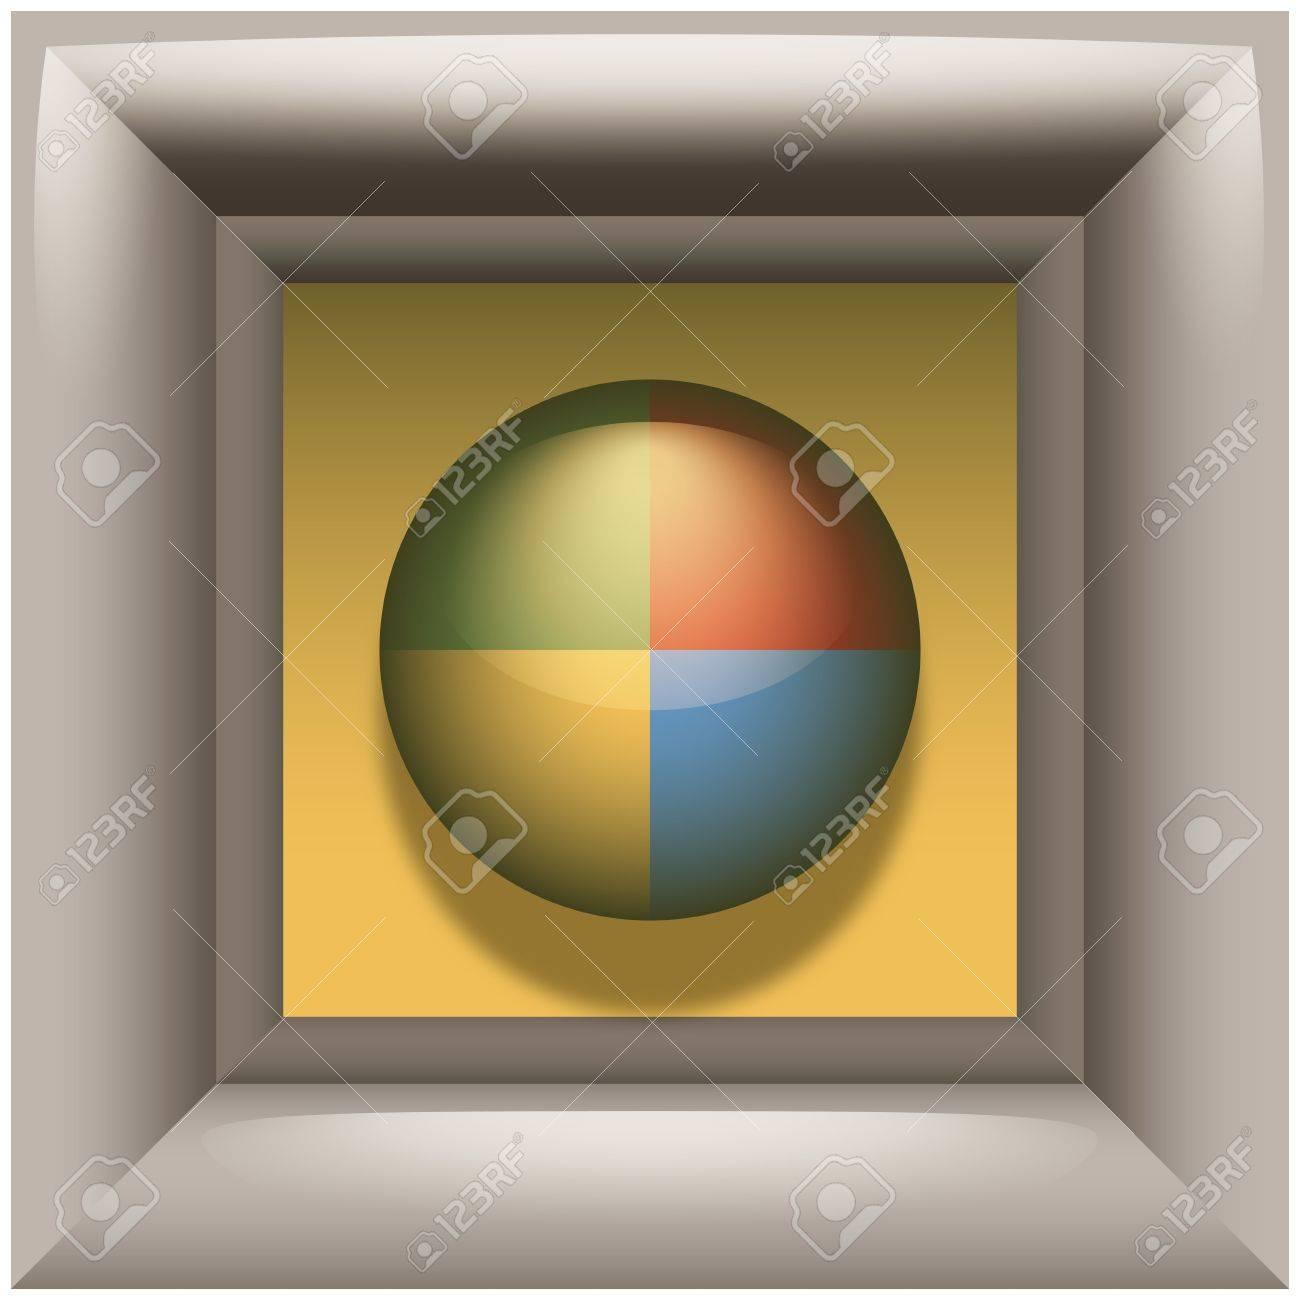 Gallery Icon Stock Vector - 13985998